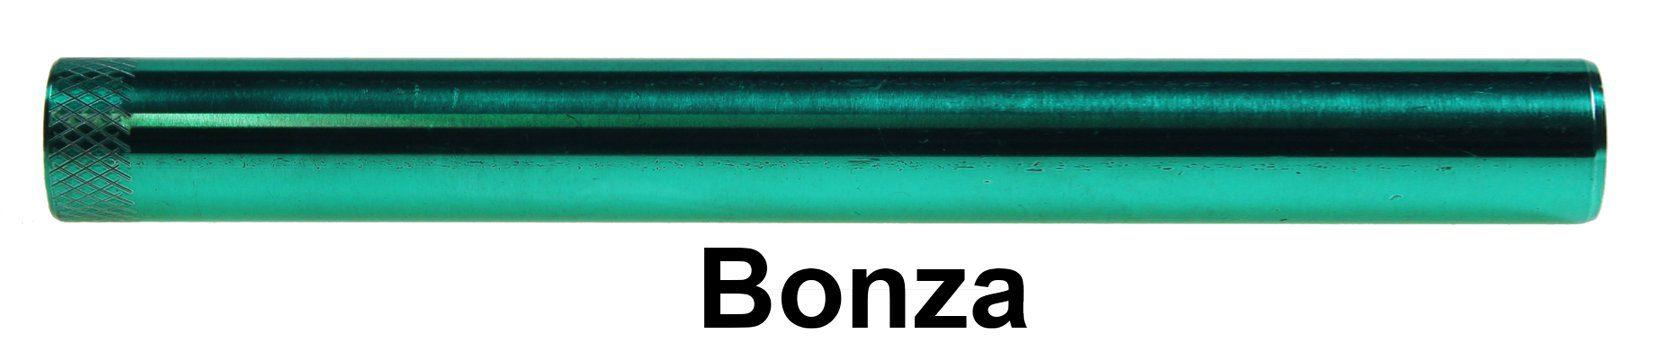 14cm Bonza Stem